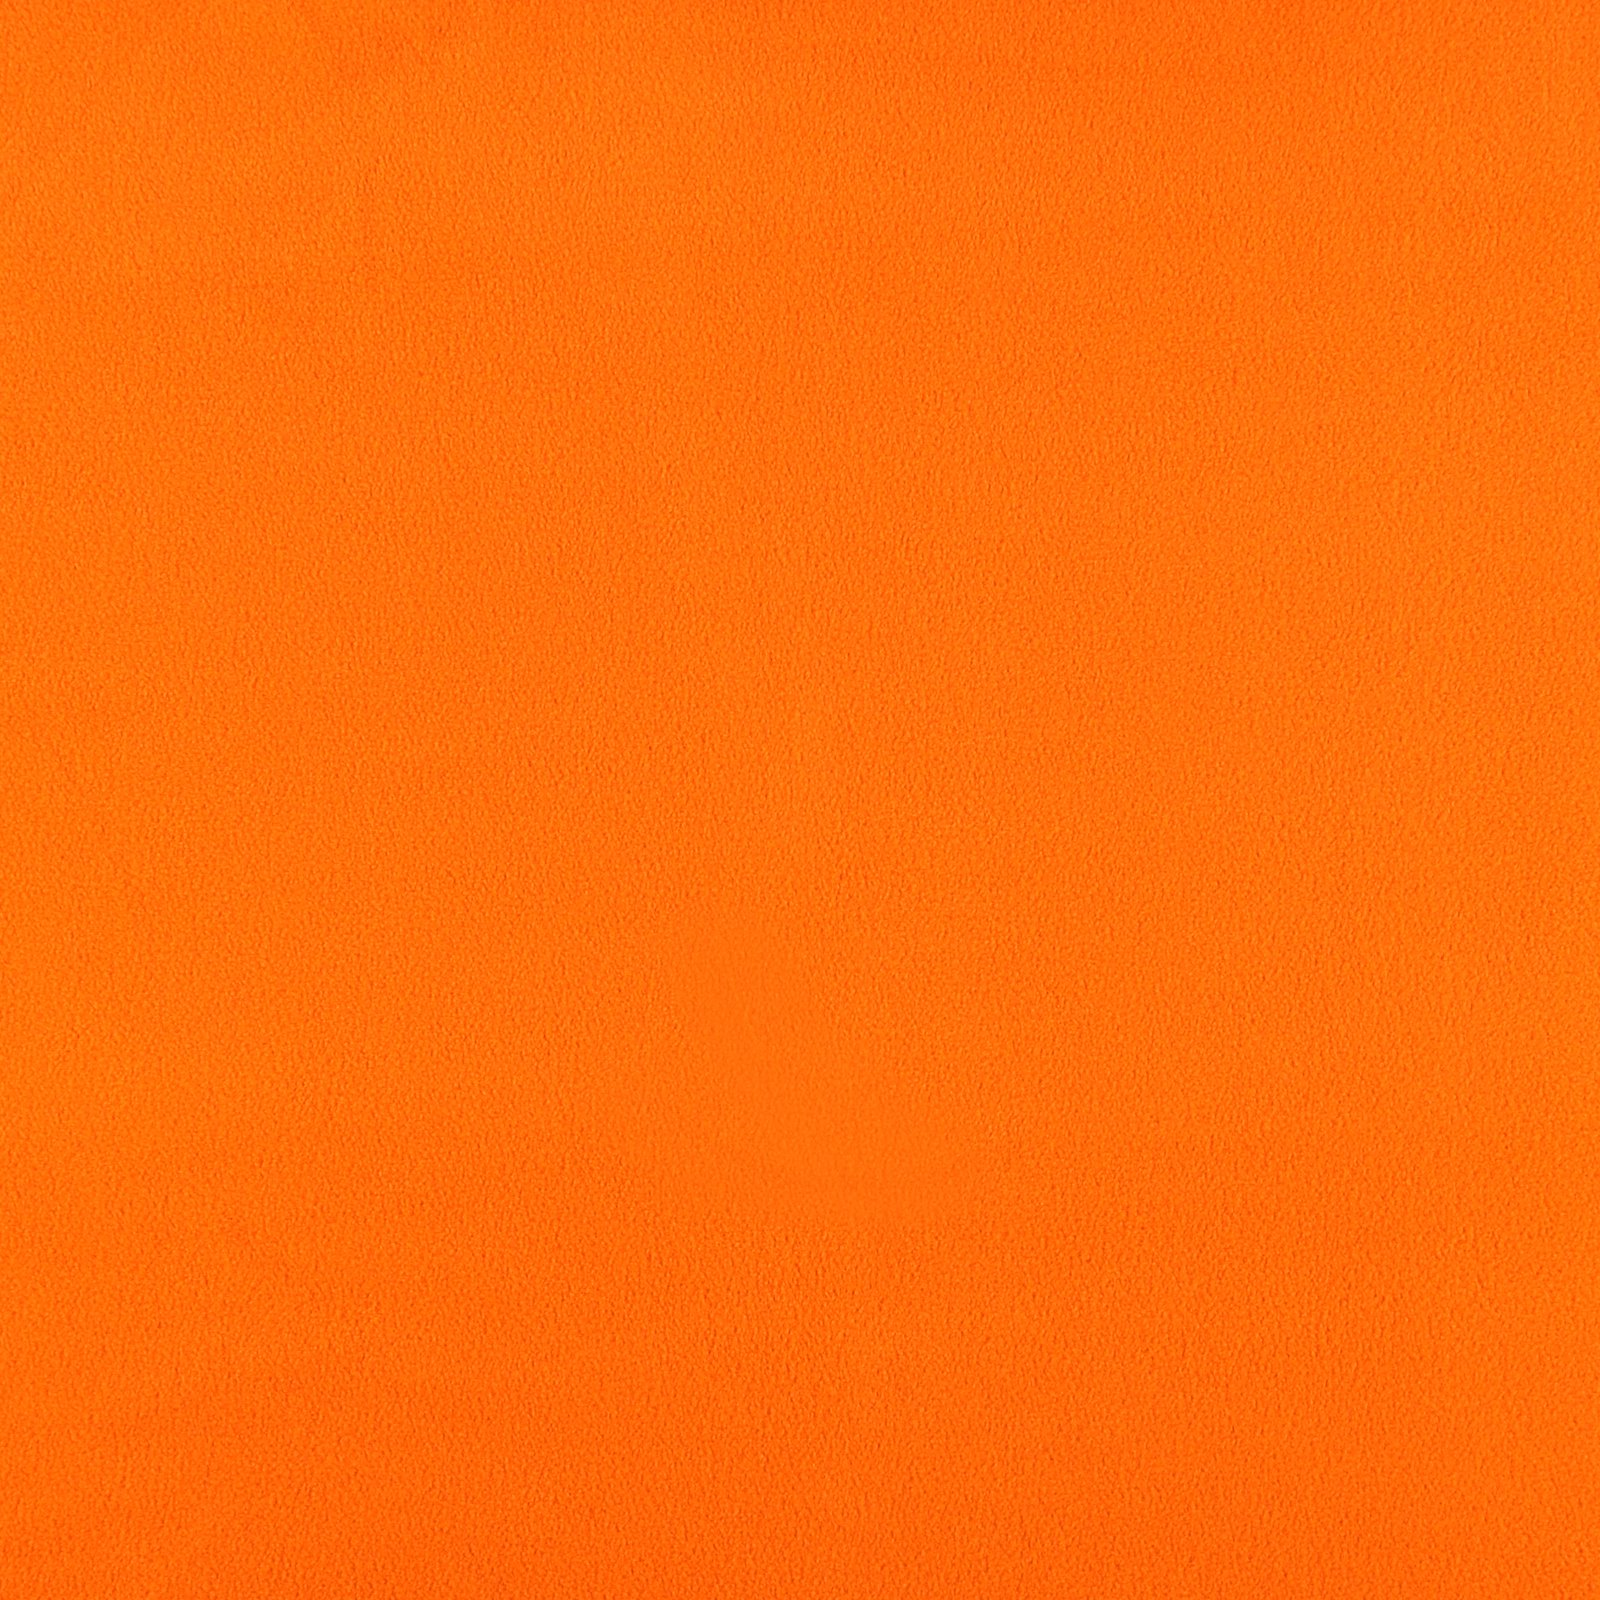 Polar fleece orange 220031_pack_solid